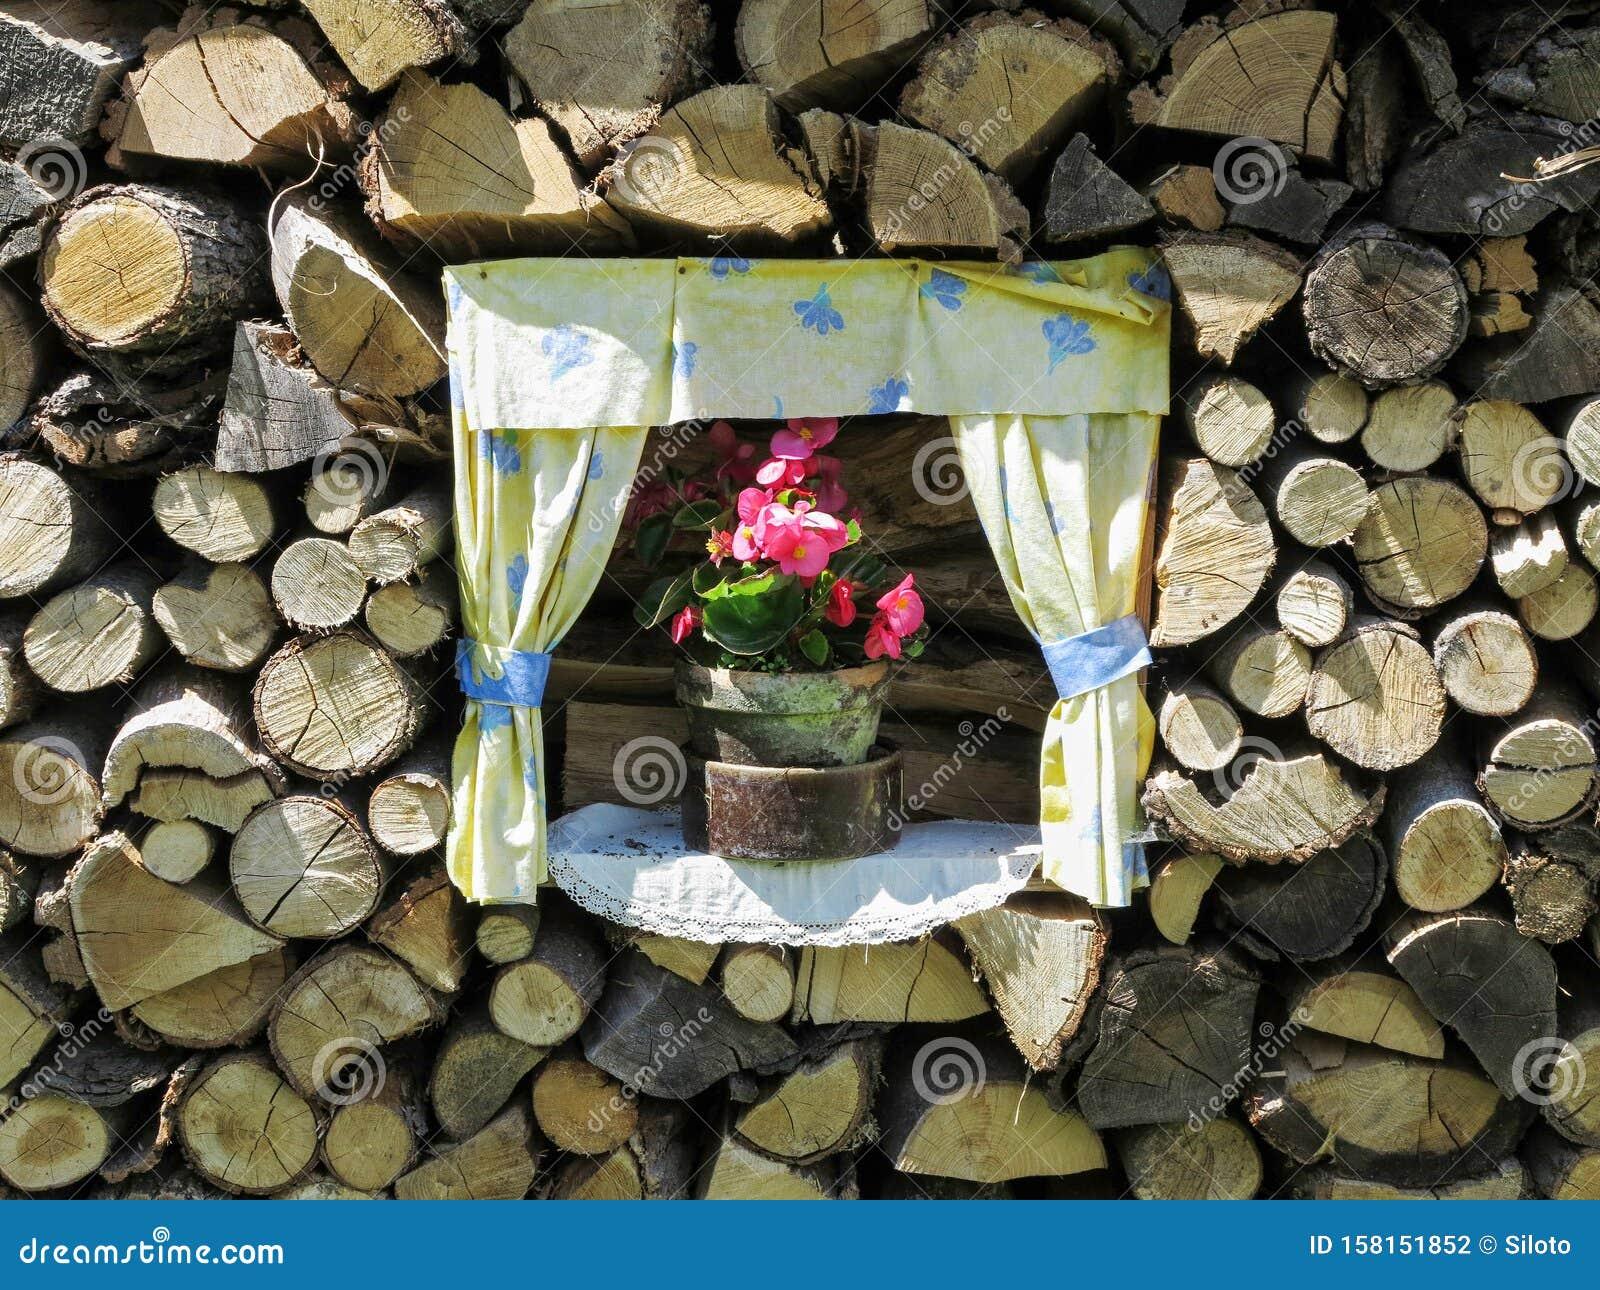 Flower in a flower pot in a woodpile